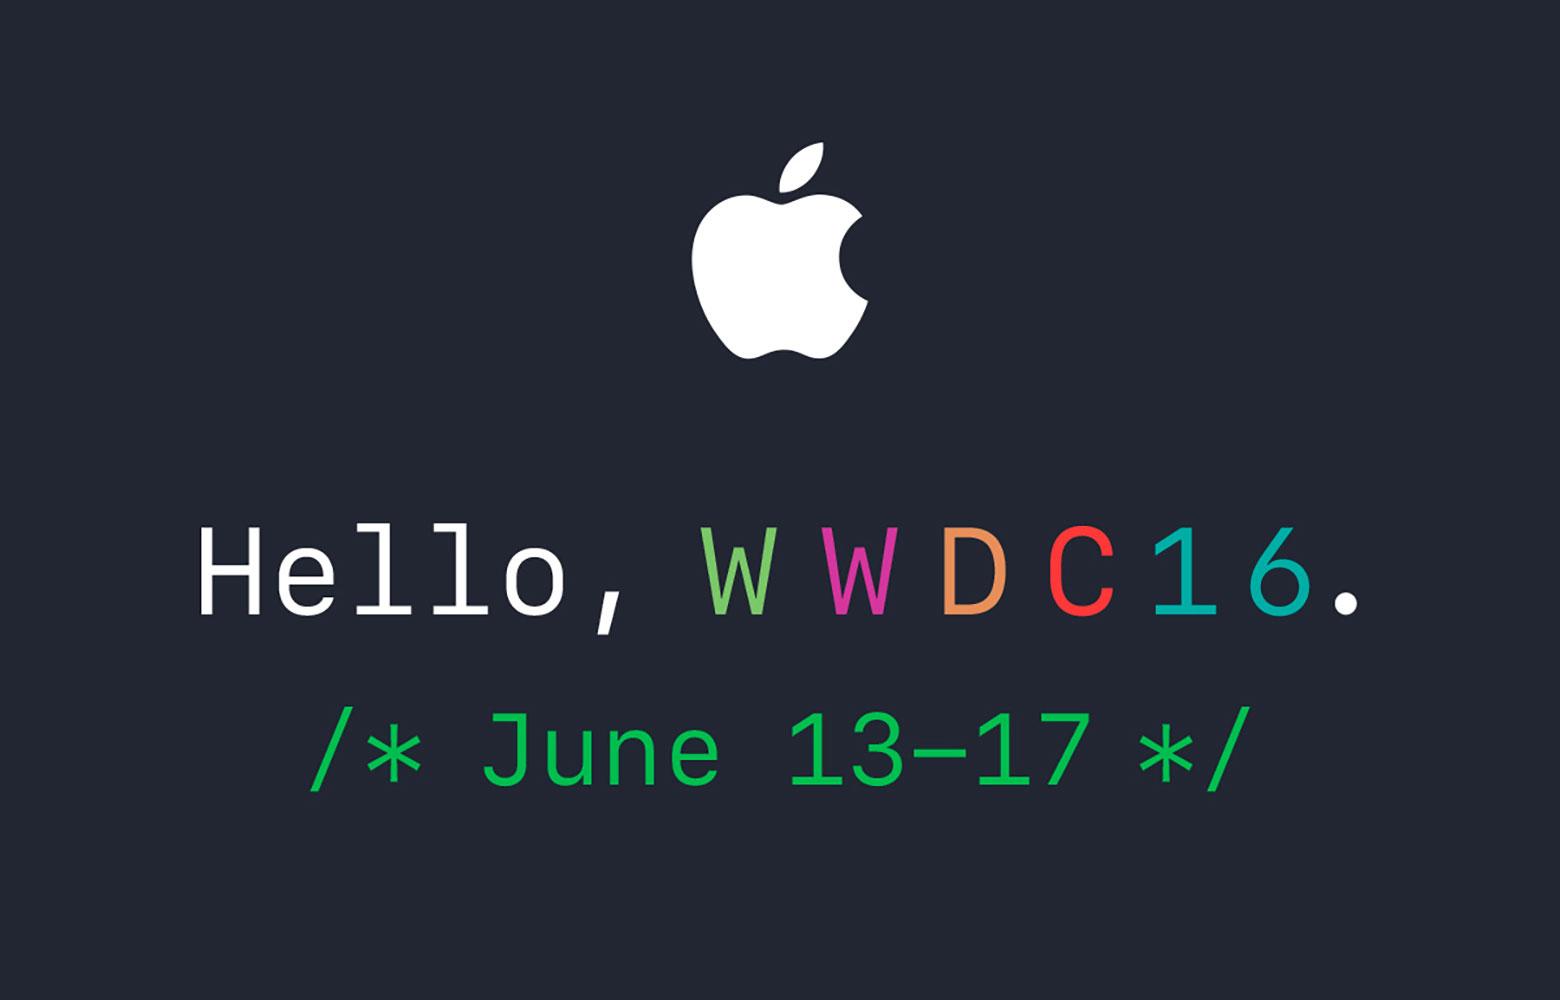 wwdc16-rumores-presentara-apple